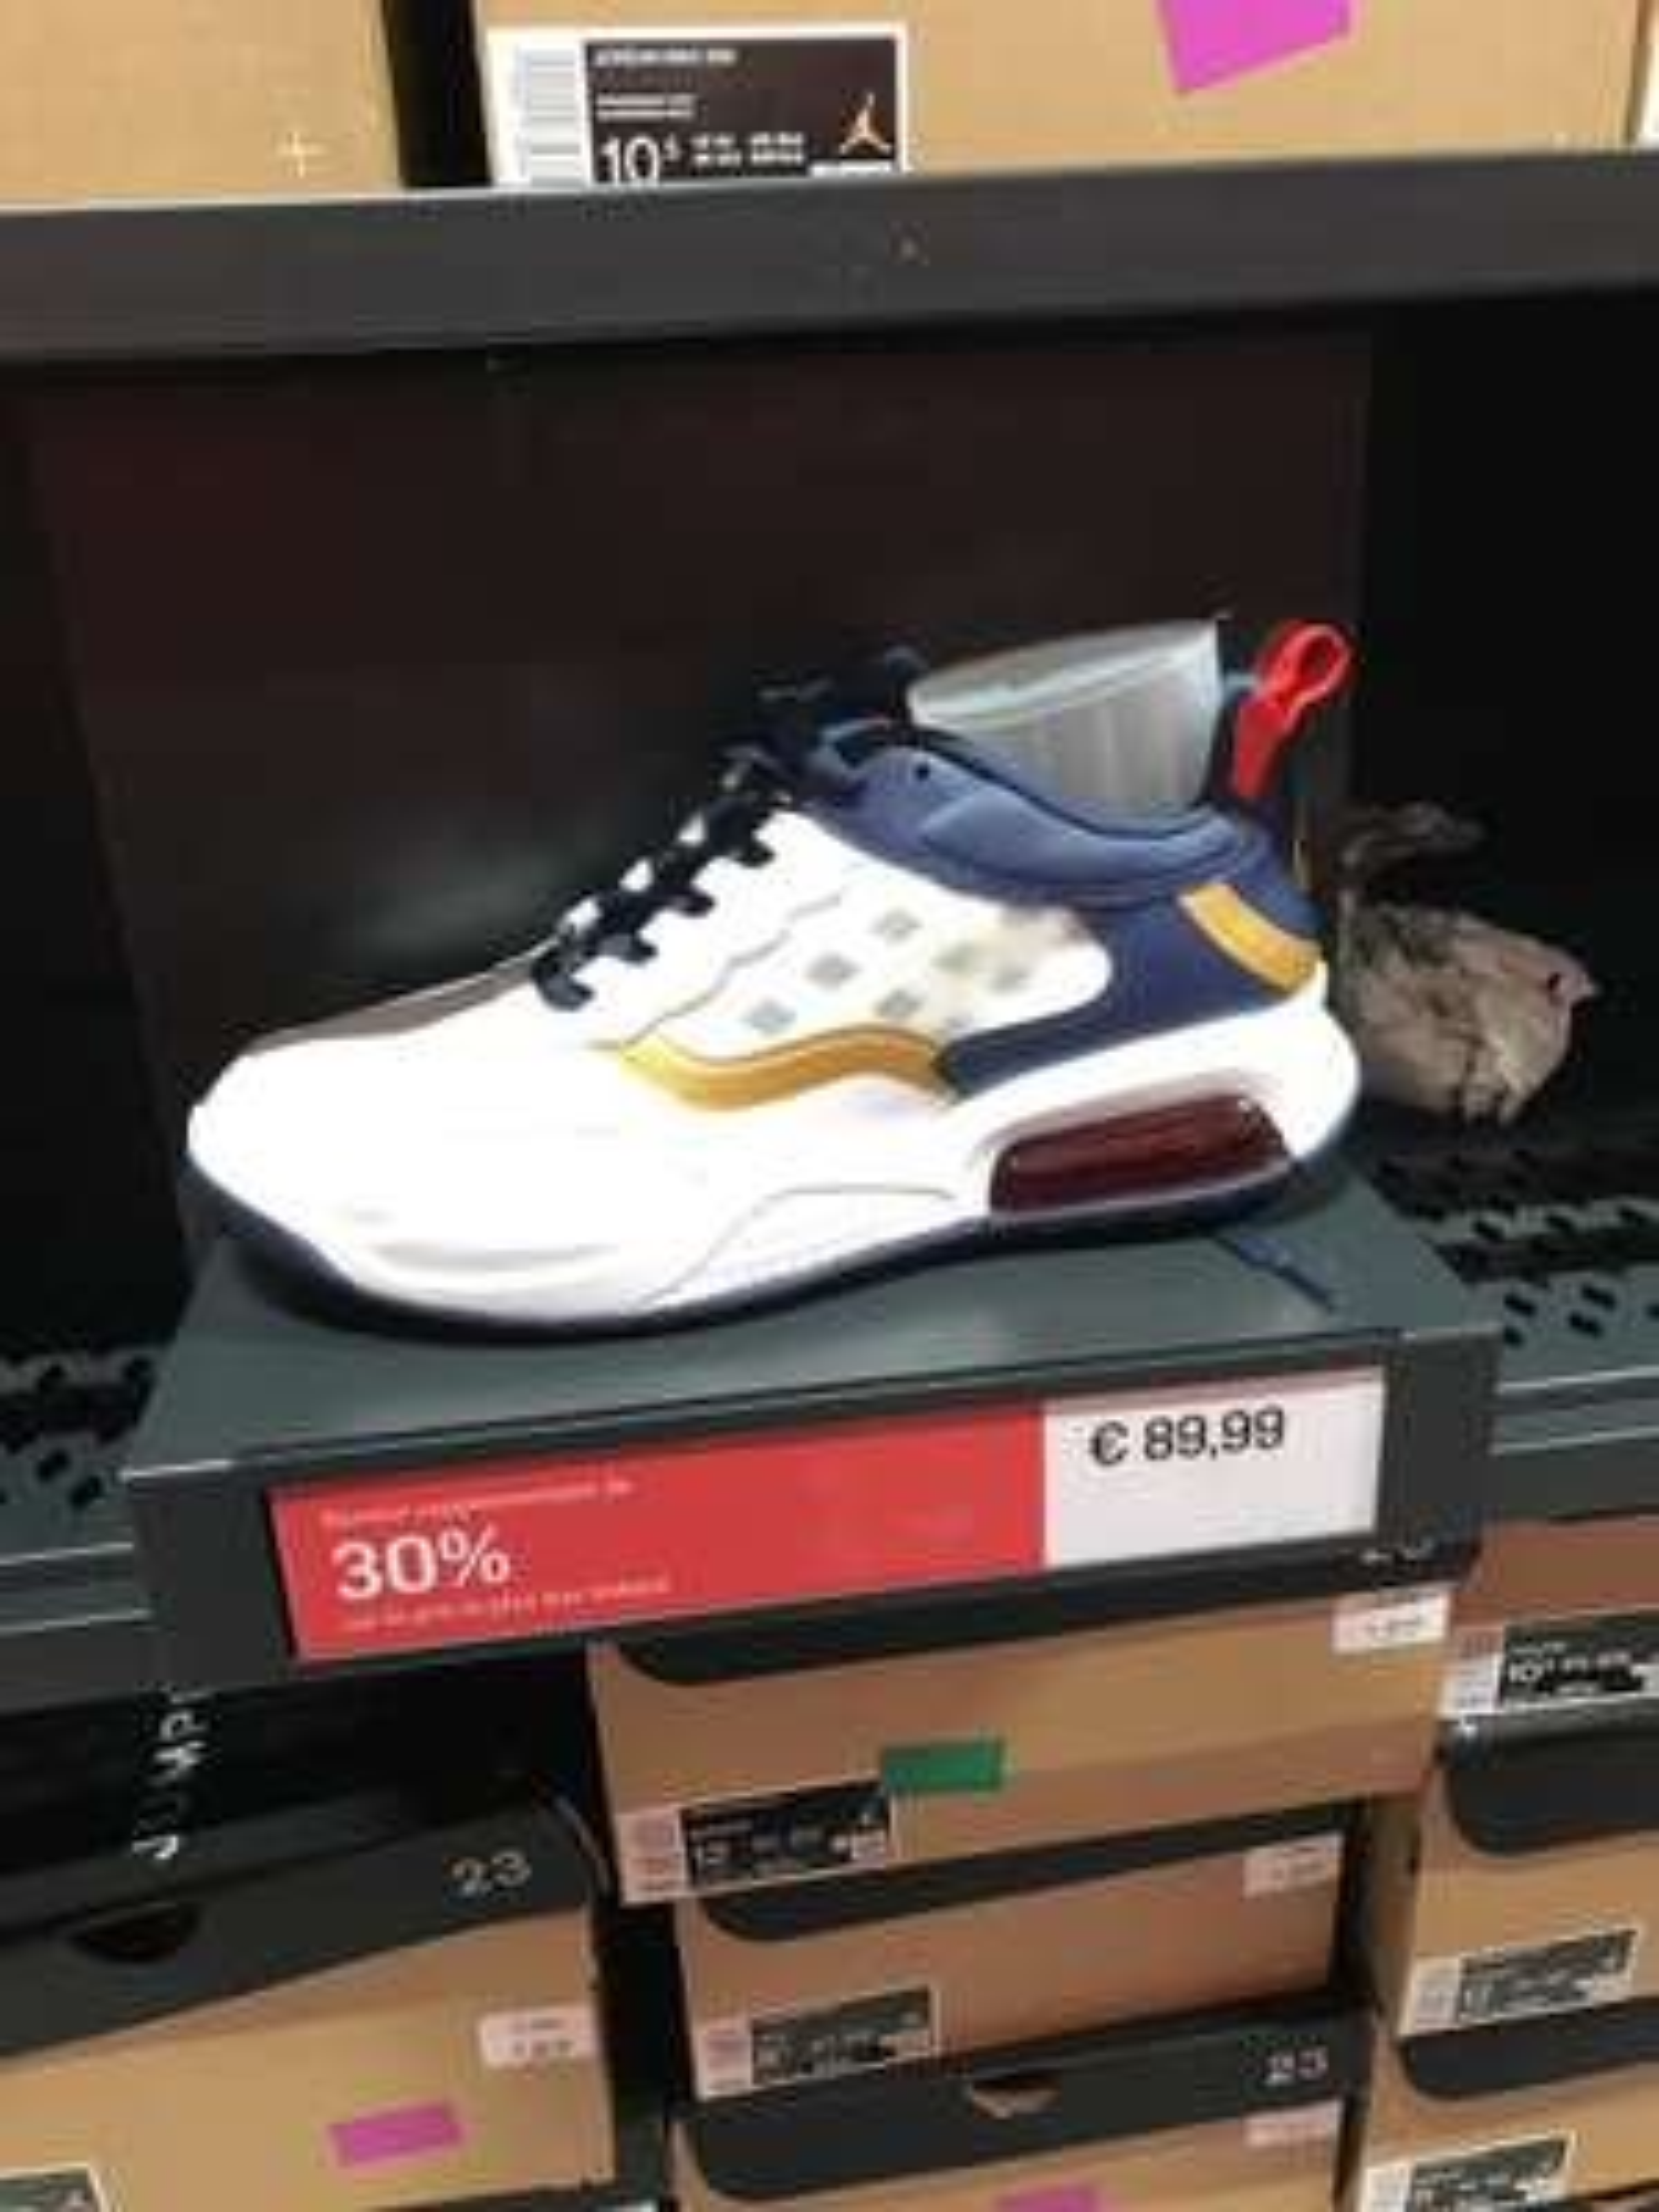 Chaussures Nike Air Jordan Max 200 (blanc/bleu, différentes tailles) - Nike Factory Store Corbeil-Essonnes (91)